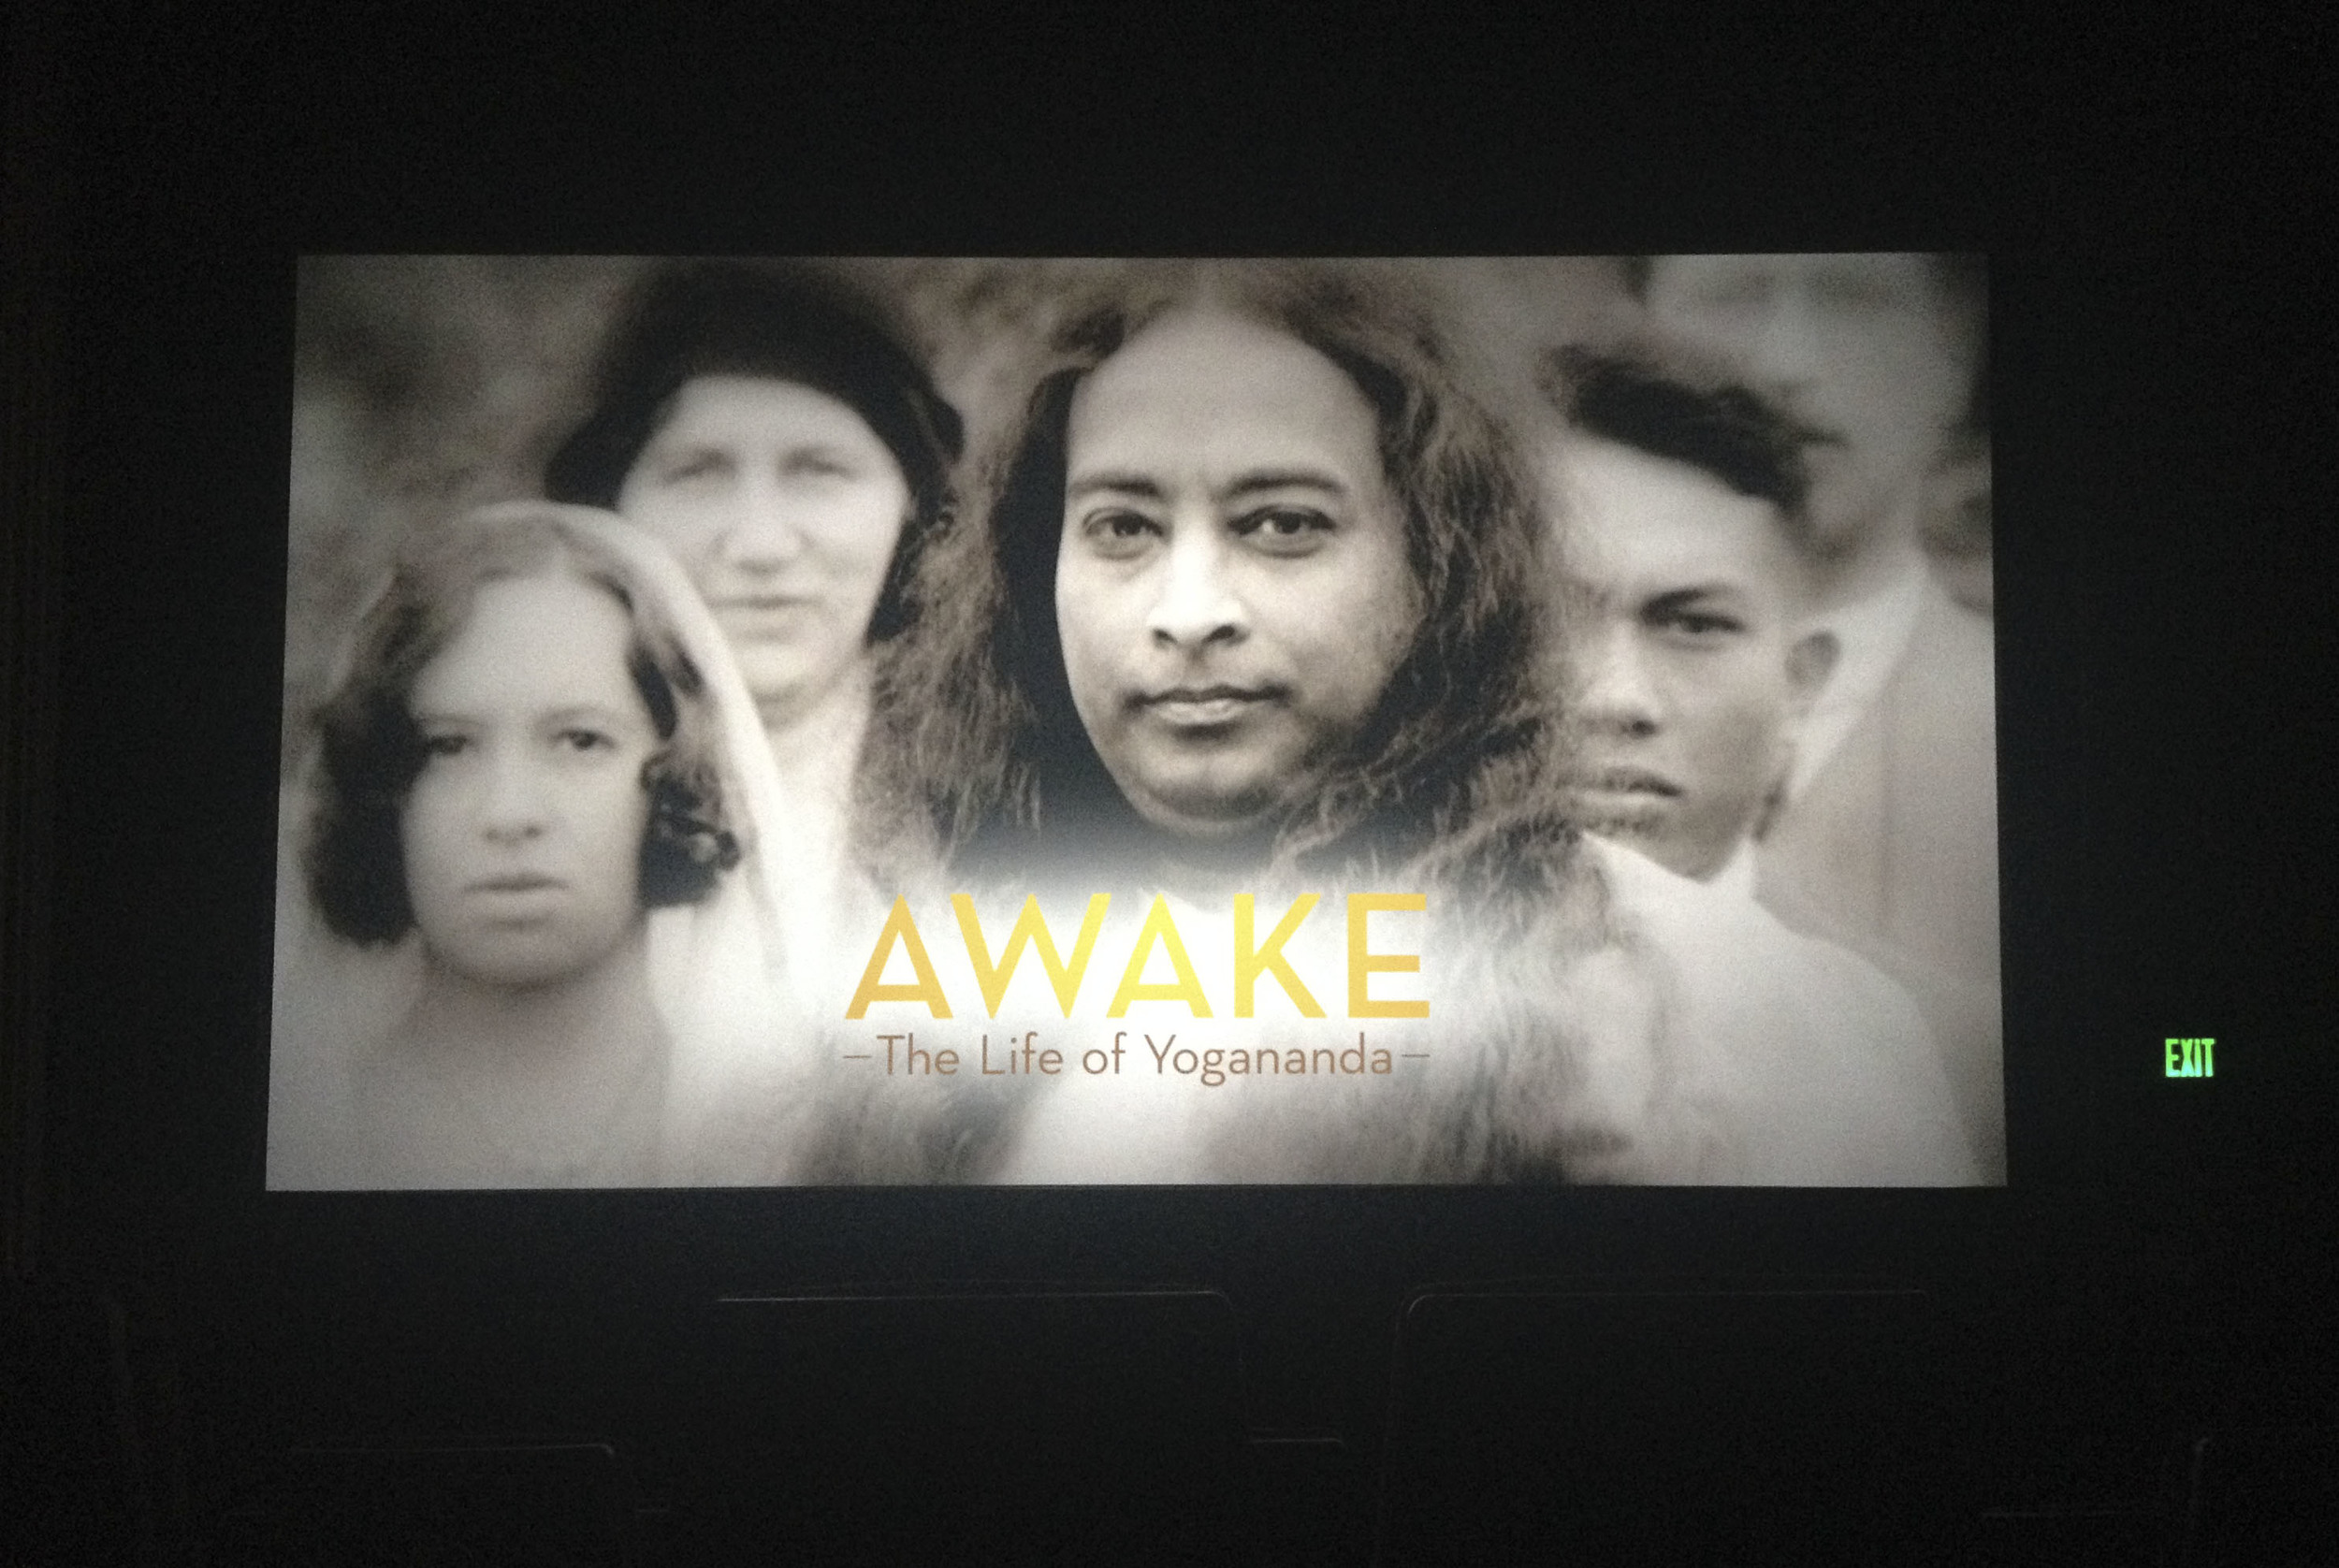 Awake- the life of Yogananda, west hollywood, los angeles, california2437.jpg